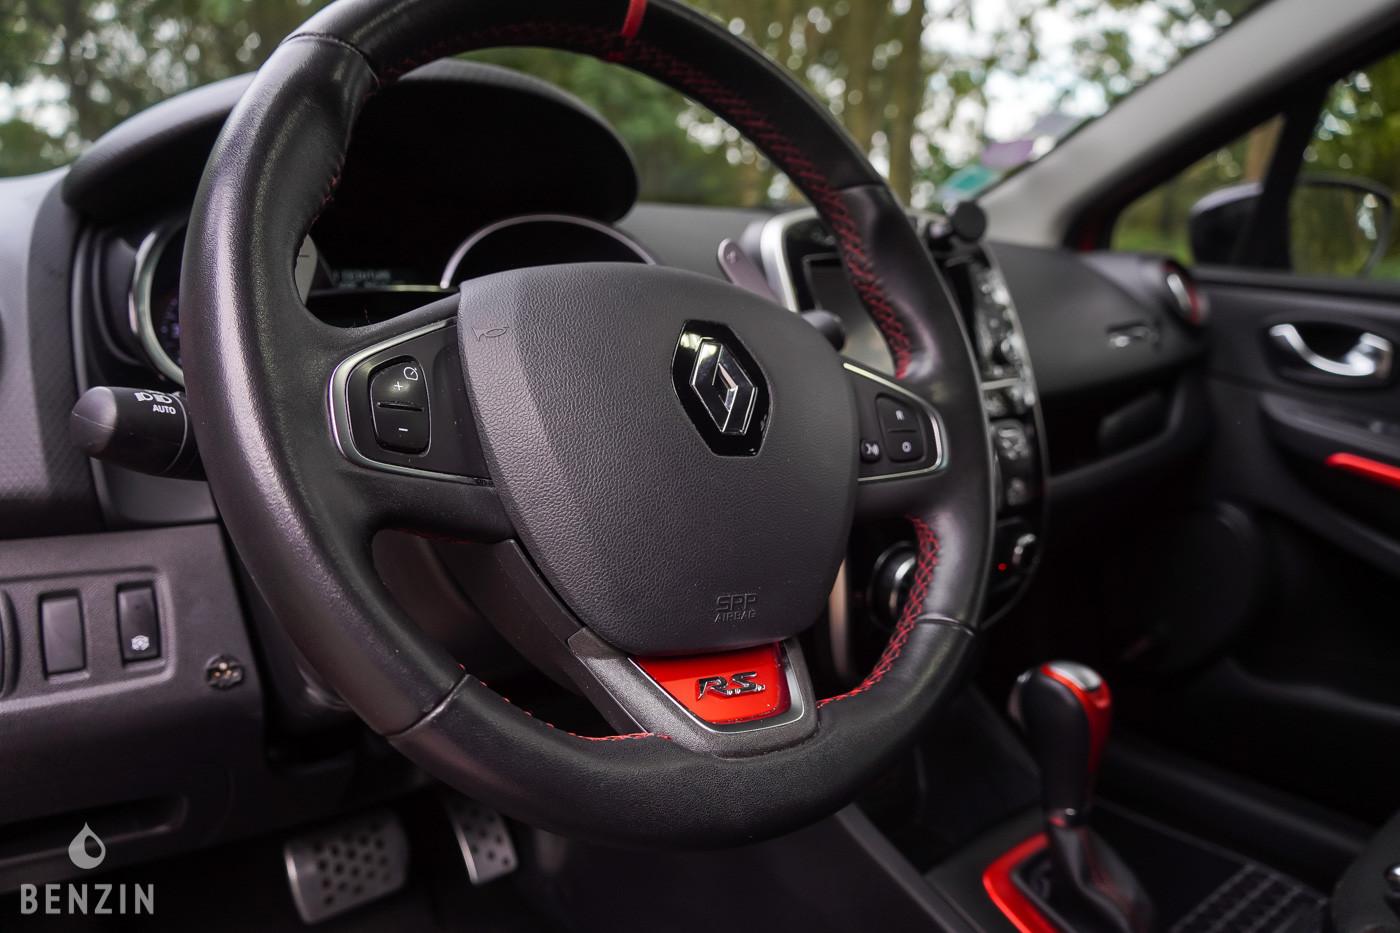 RENAULT CLIO 4 RS OCCASION - 2015